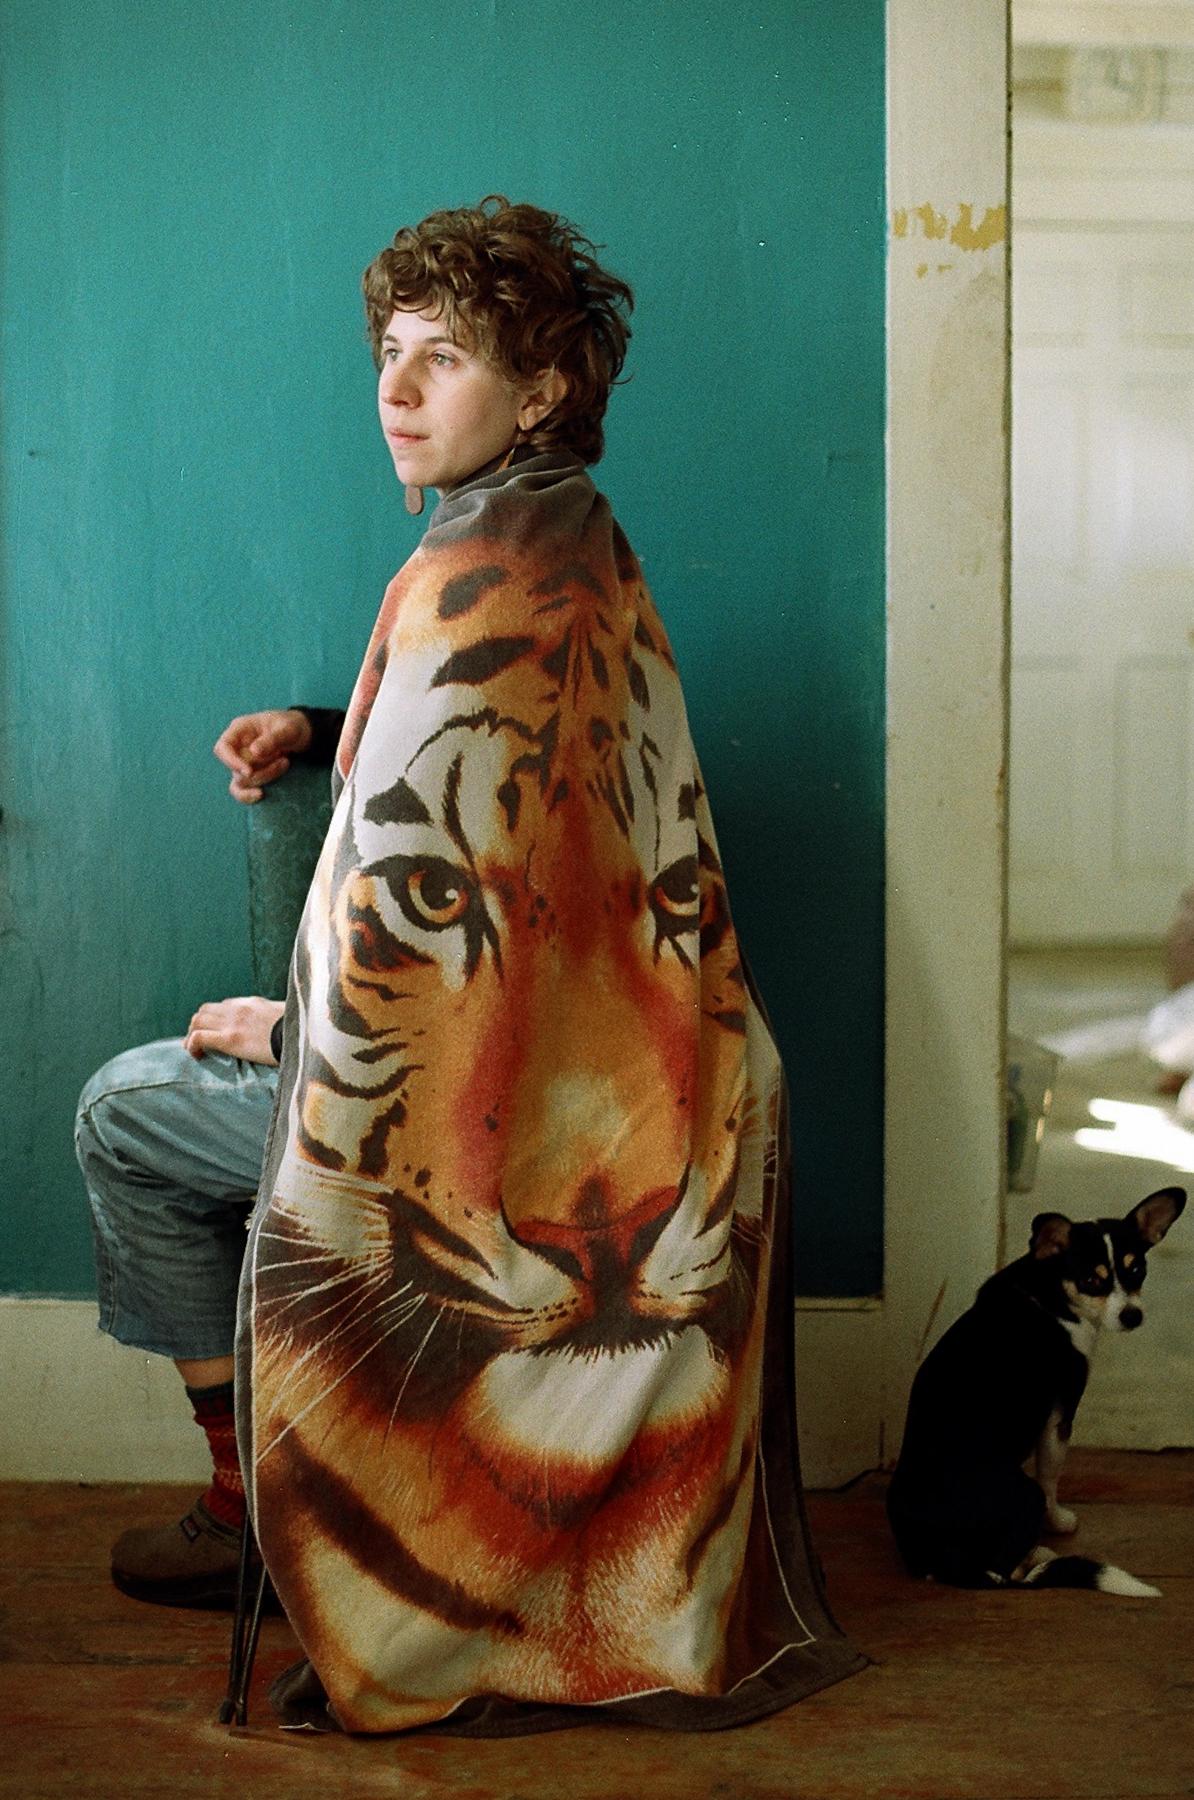 Becca + her tiger towel